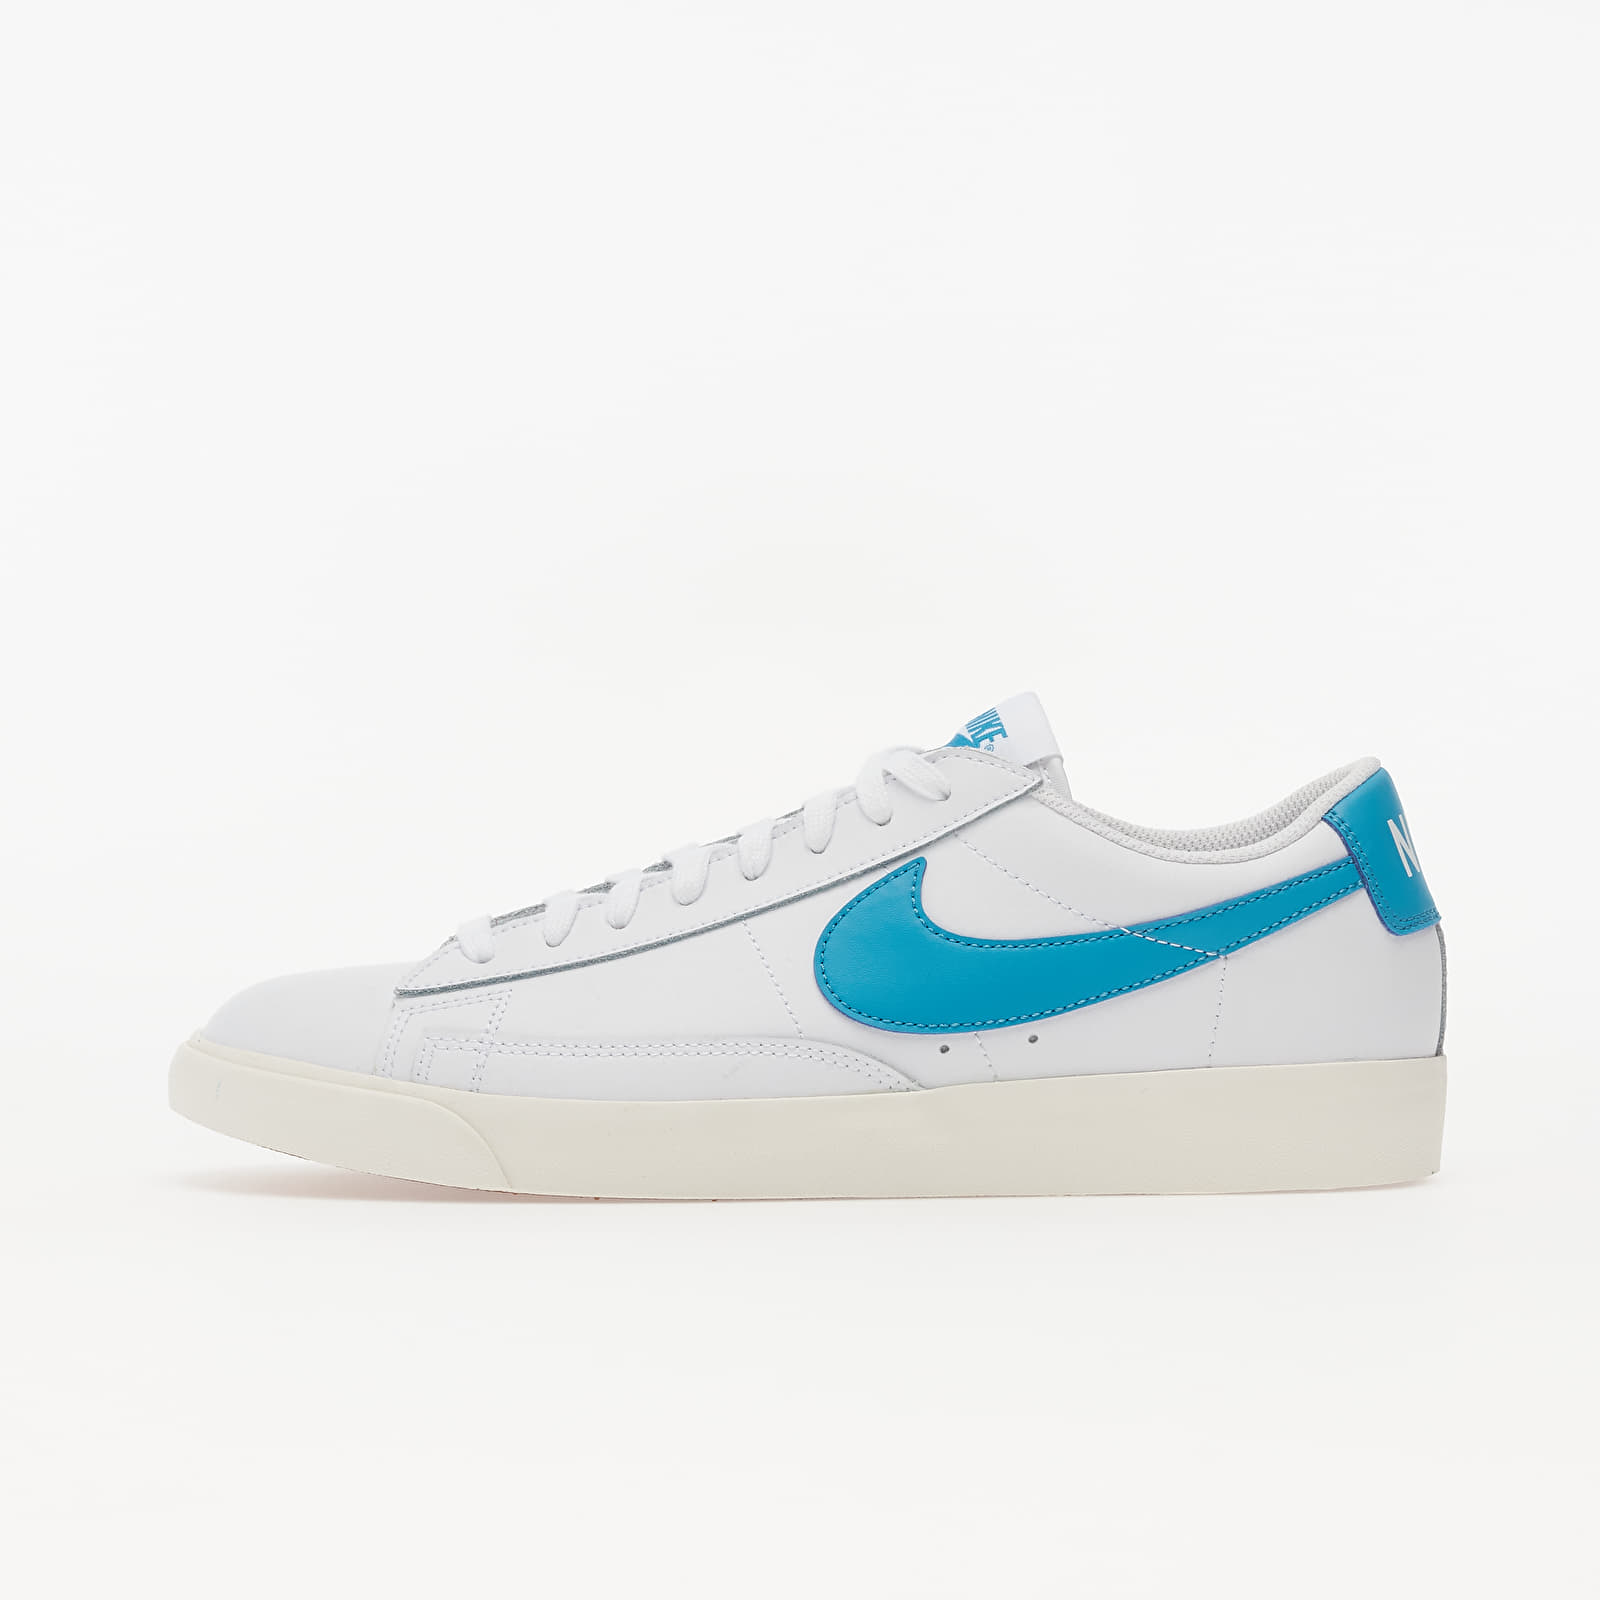 Men's shoes Nike Blazer Low Leather White/ Laser Blue-Sail